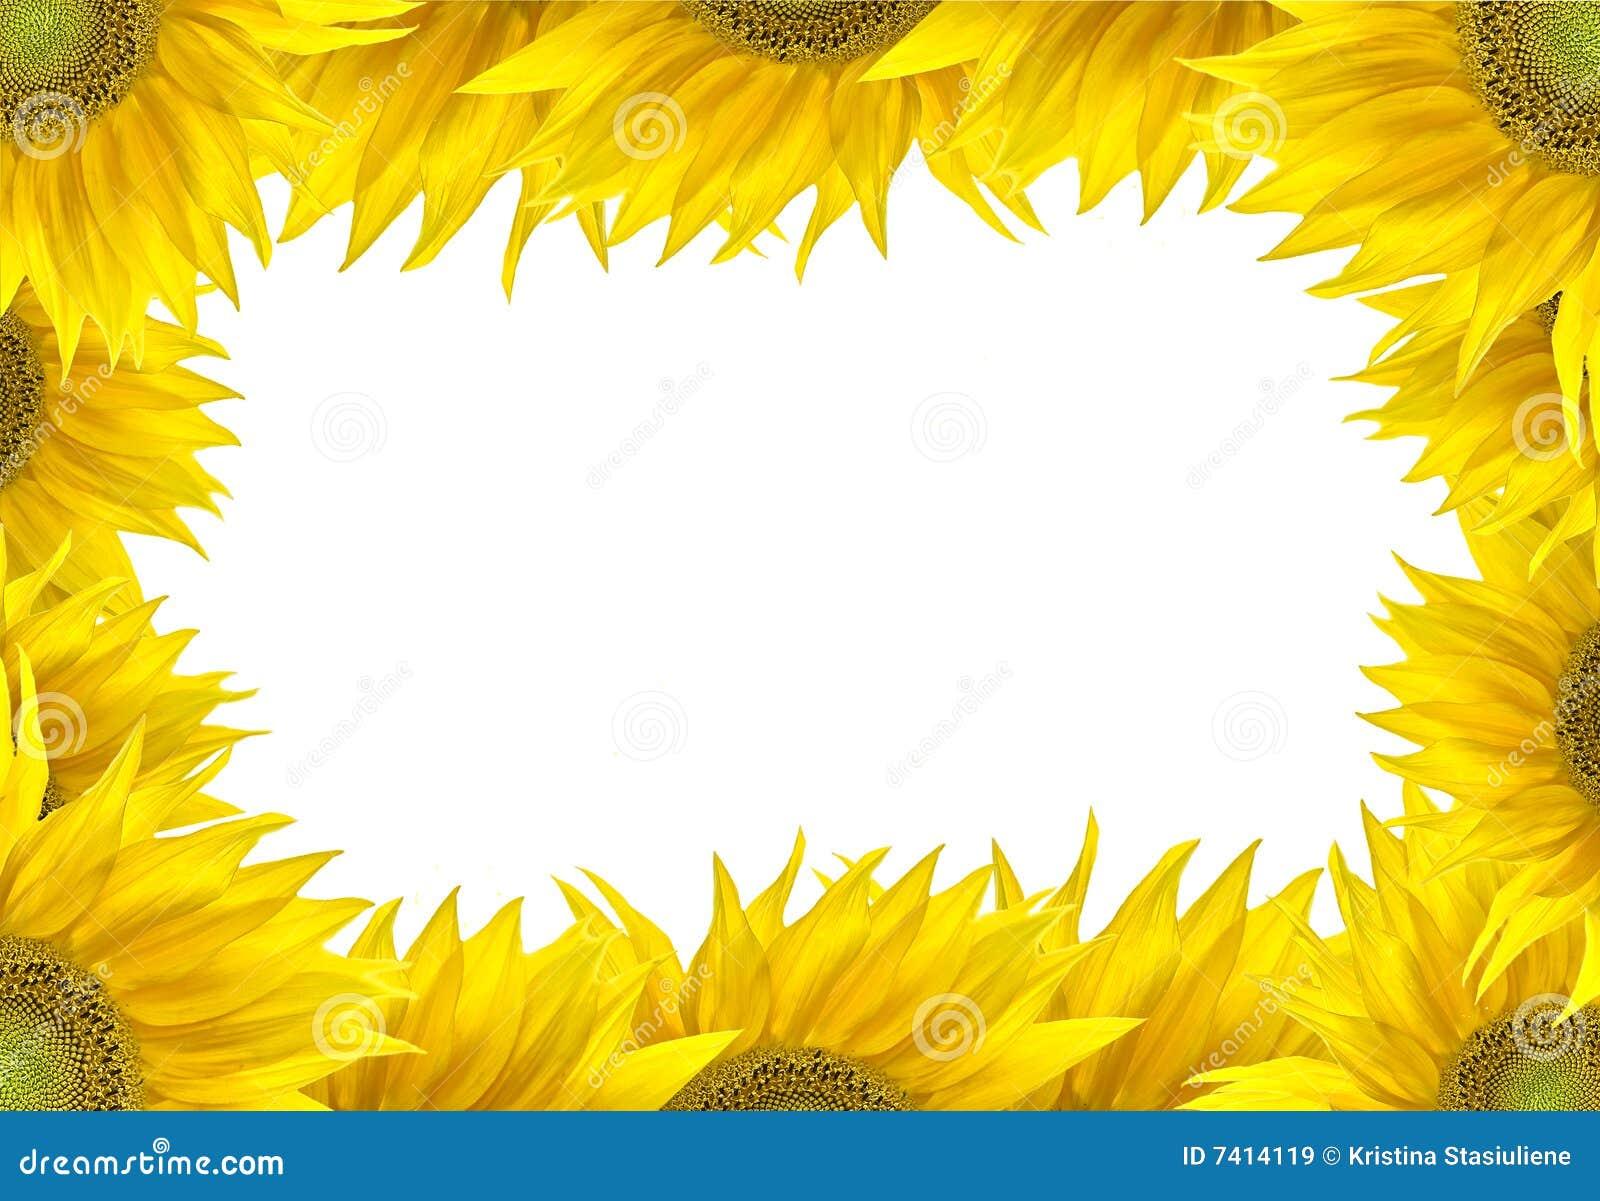 Sunflower frame stock image. Image of fresh, closeup, plant - 7414119